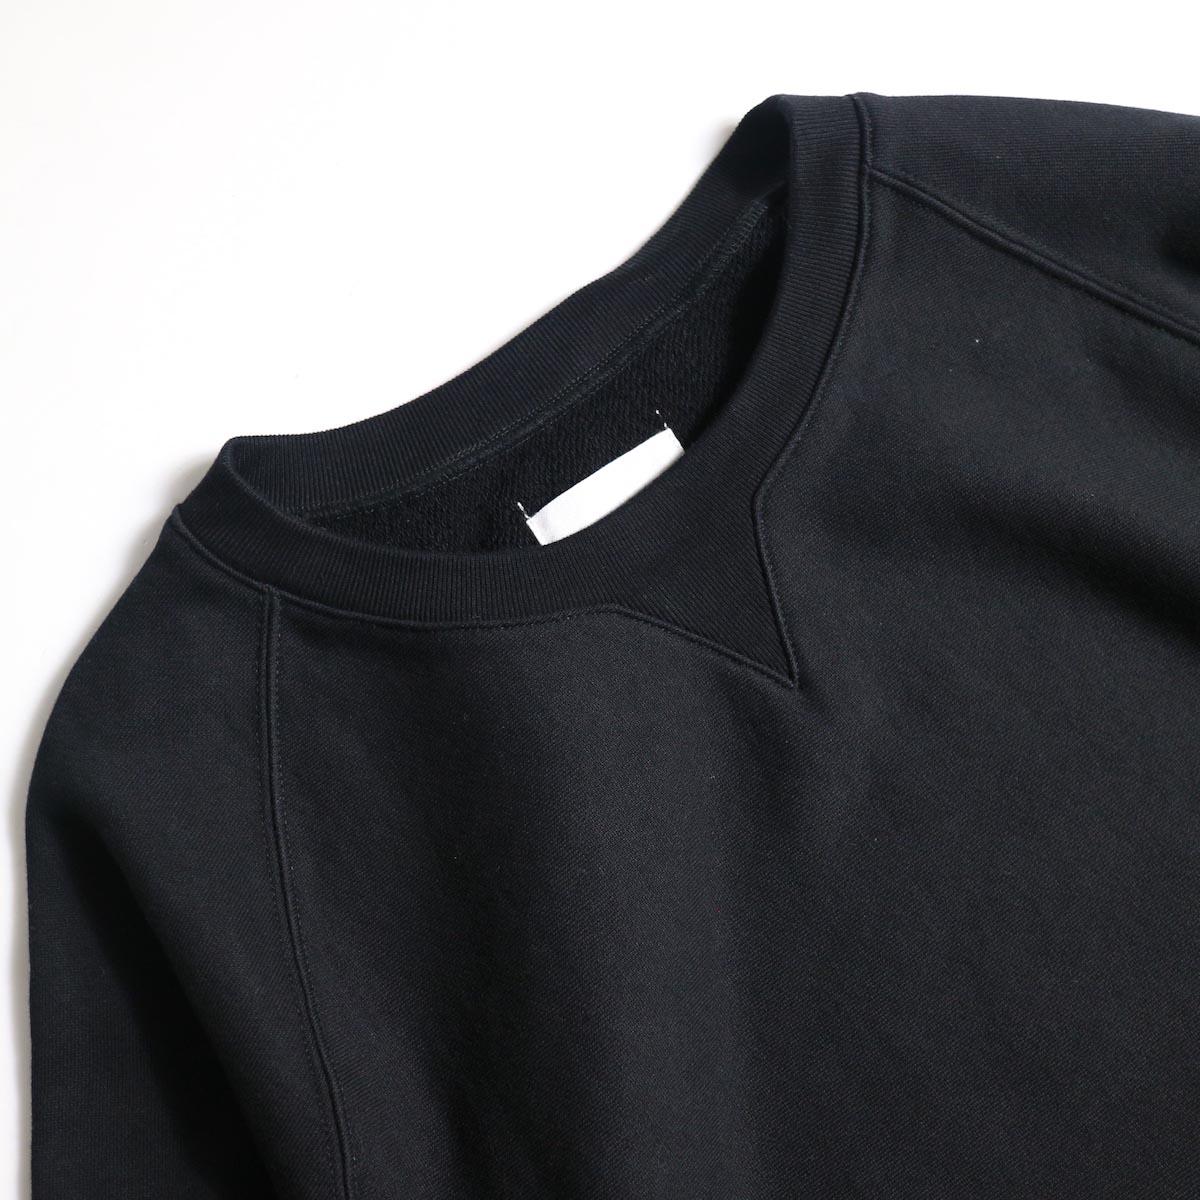 The Soloist / sc.0013bAW20 crew neck sweatshirt. (Black)クルーネック